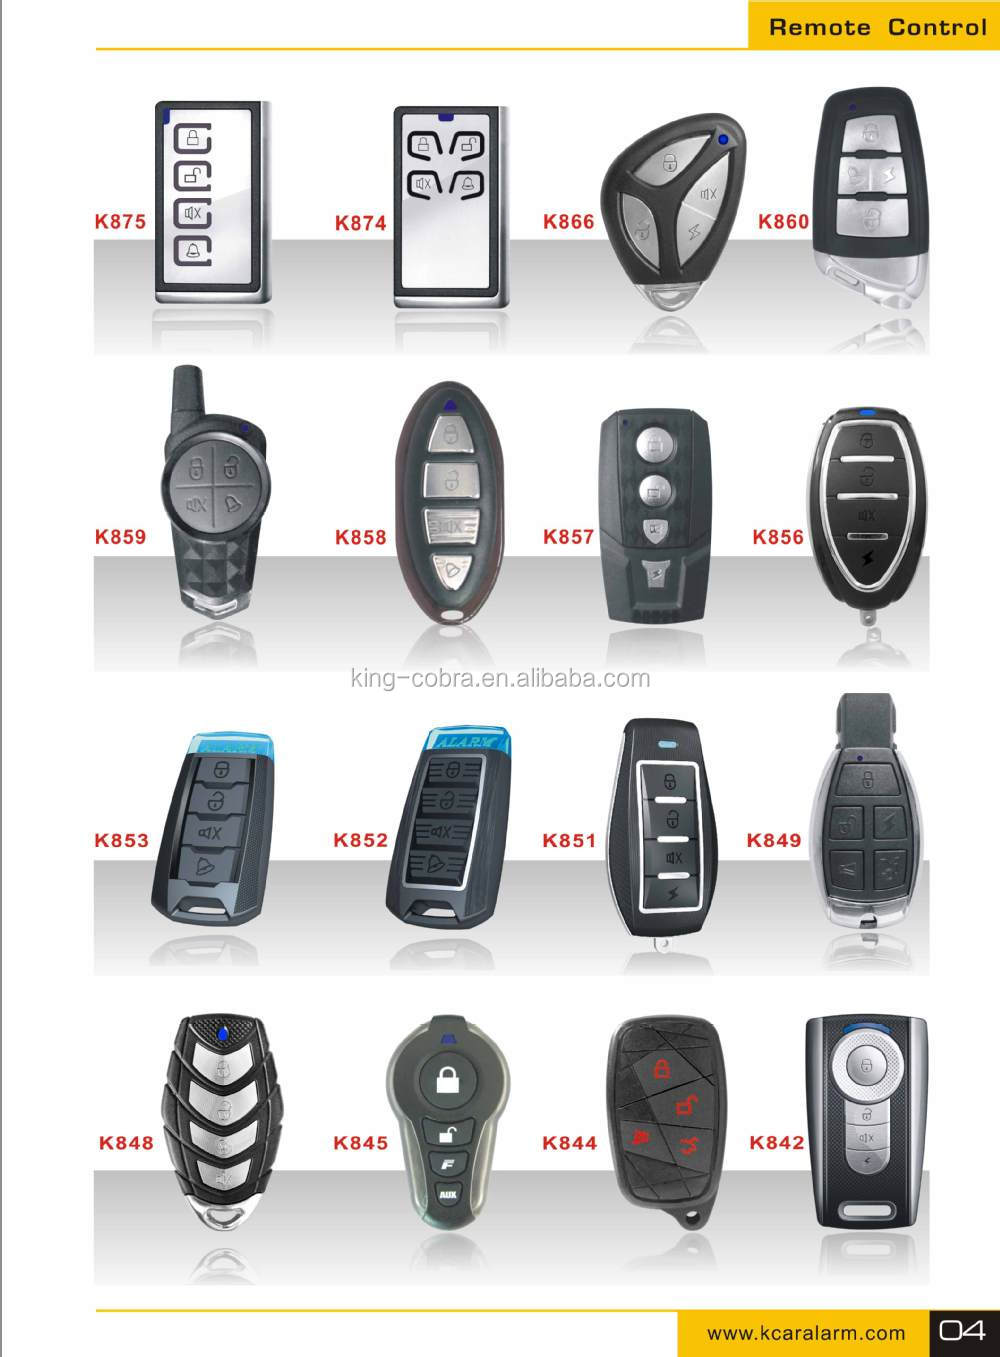 viper remote car starter user manual